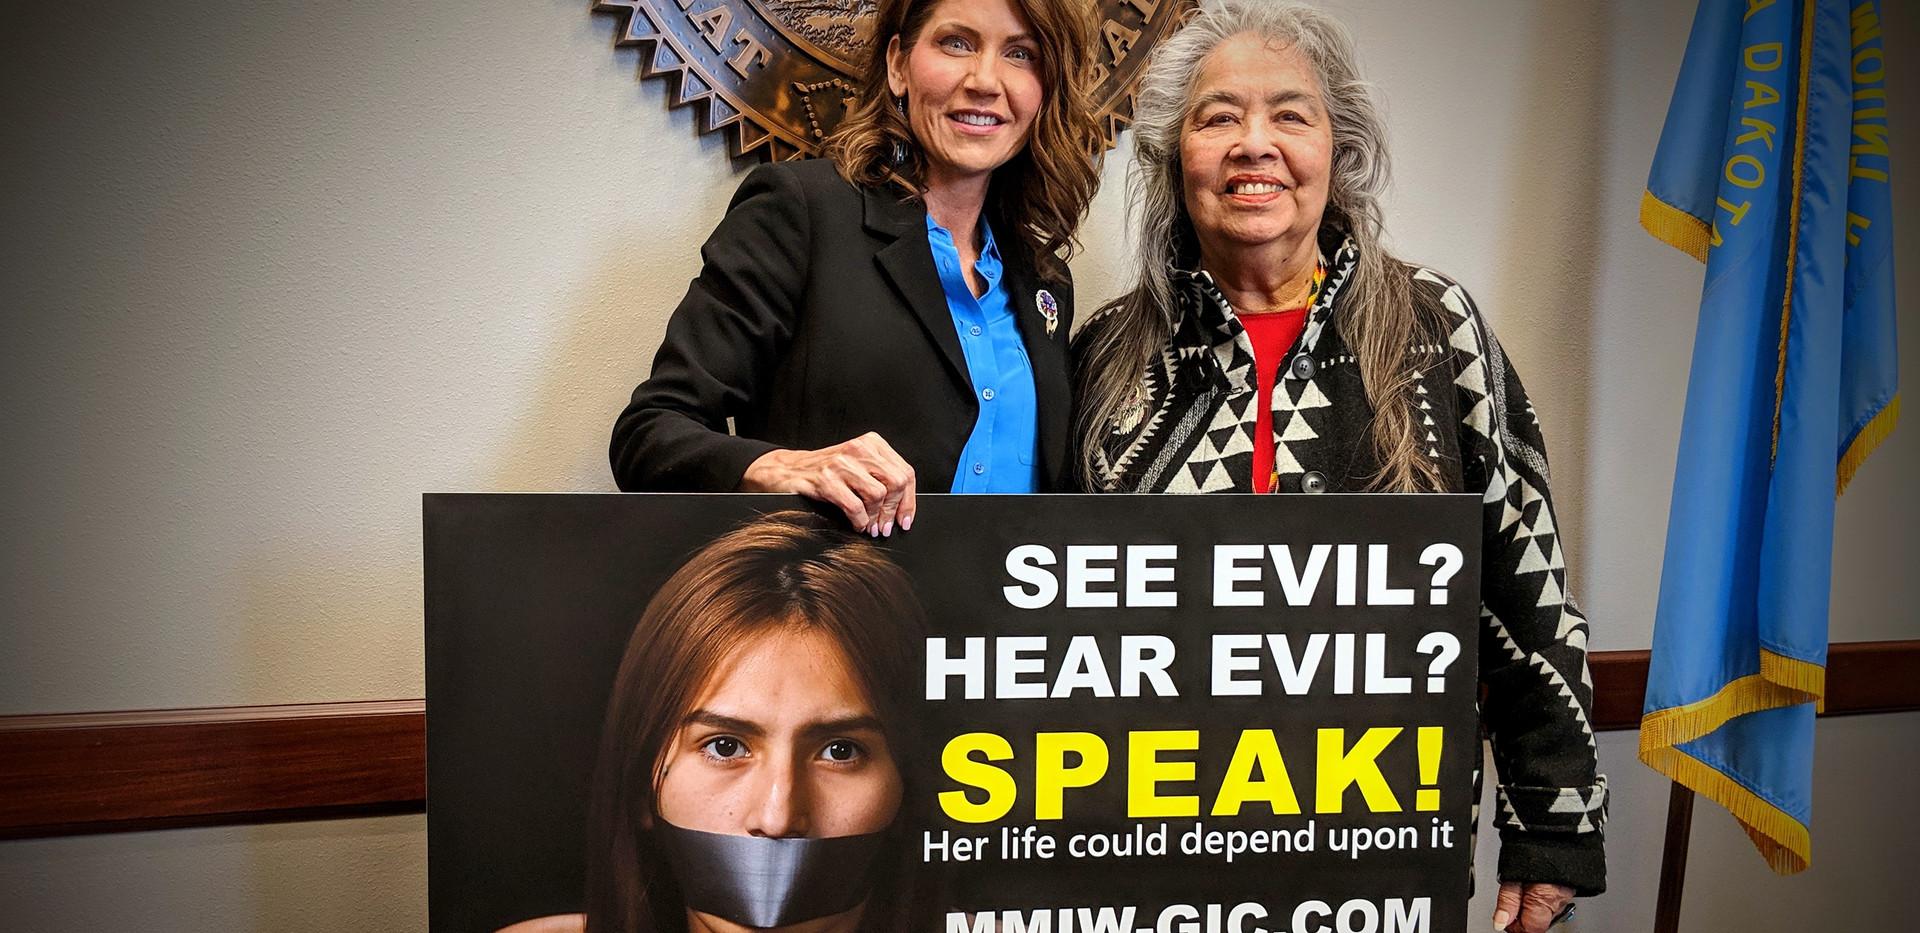 Governor Kristi Noem and GPTCA's A. Gay